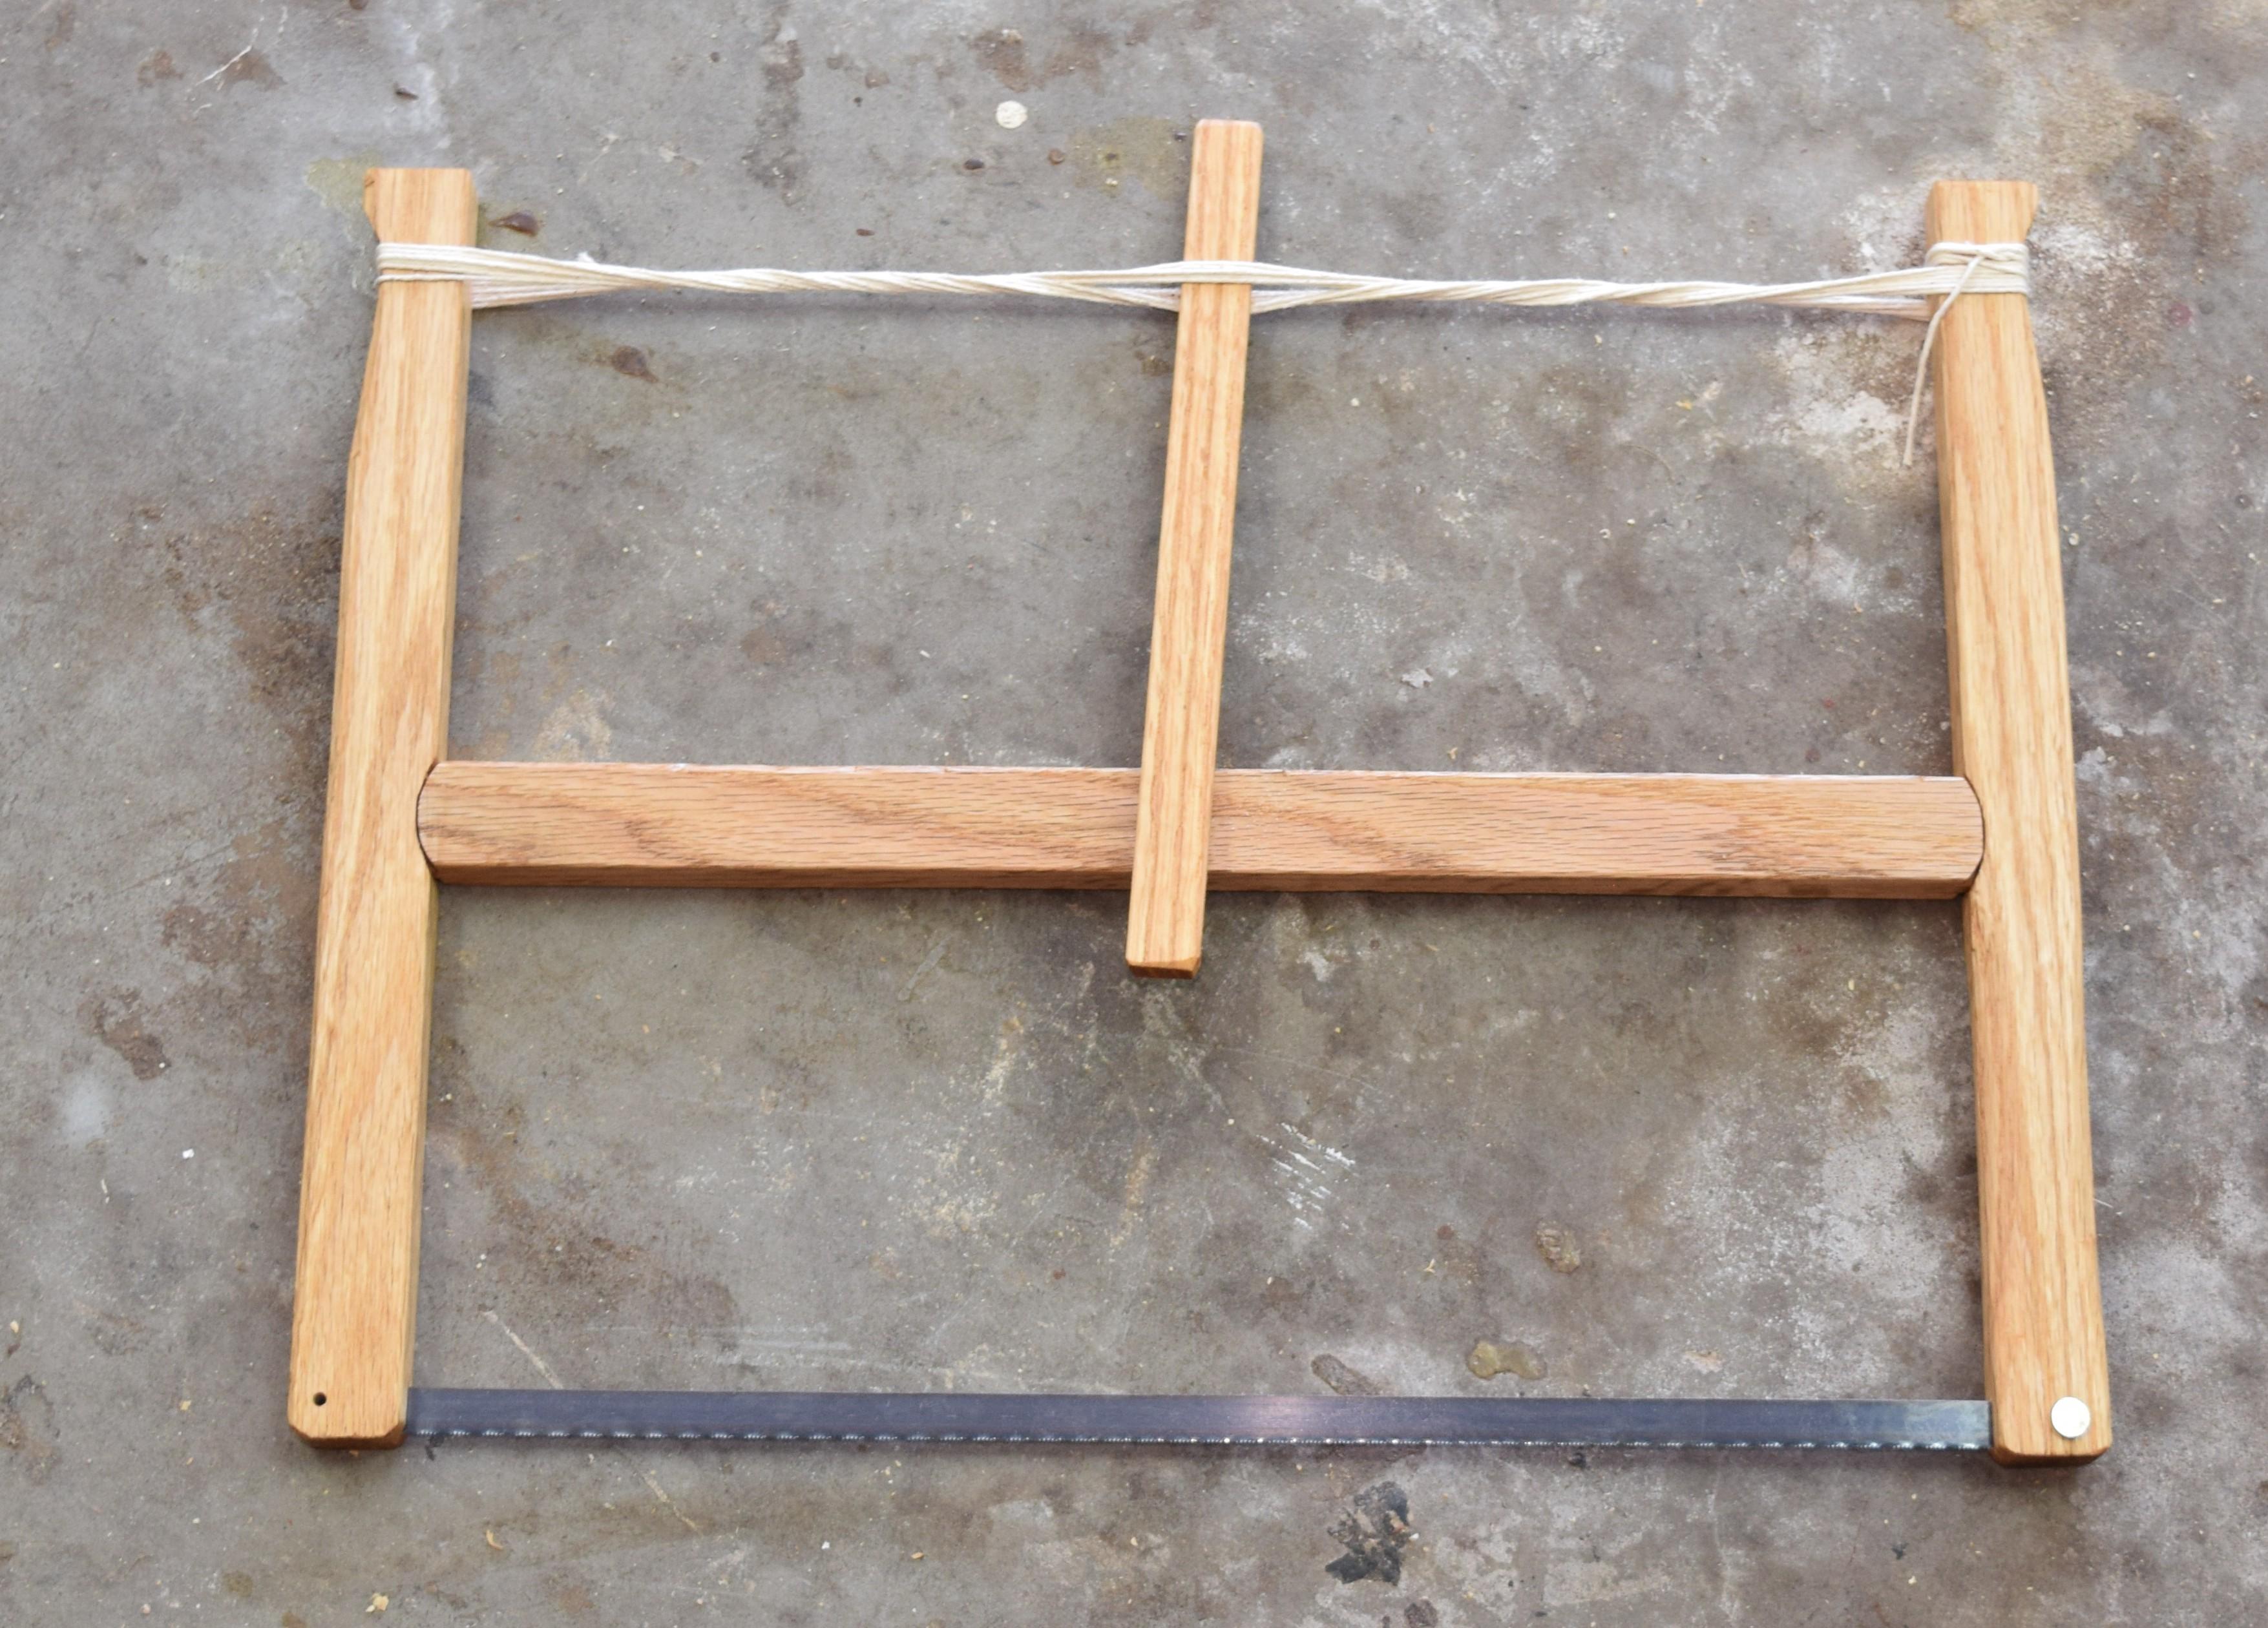 Frame Saw – Giant Hack Saw   Kilted Craft Works